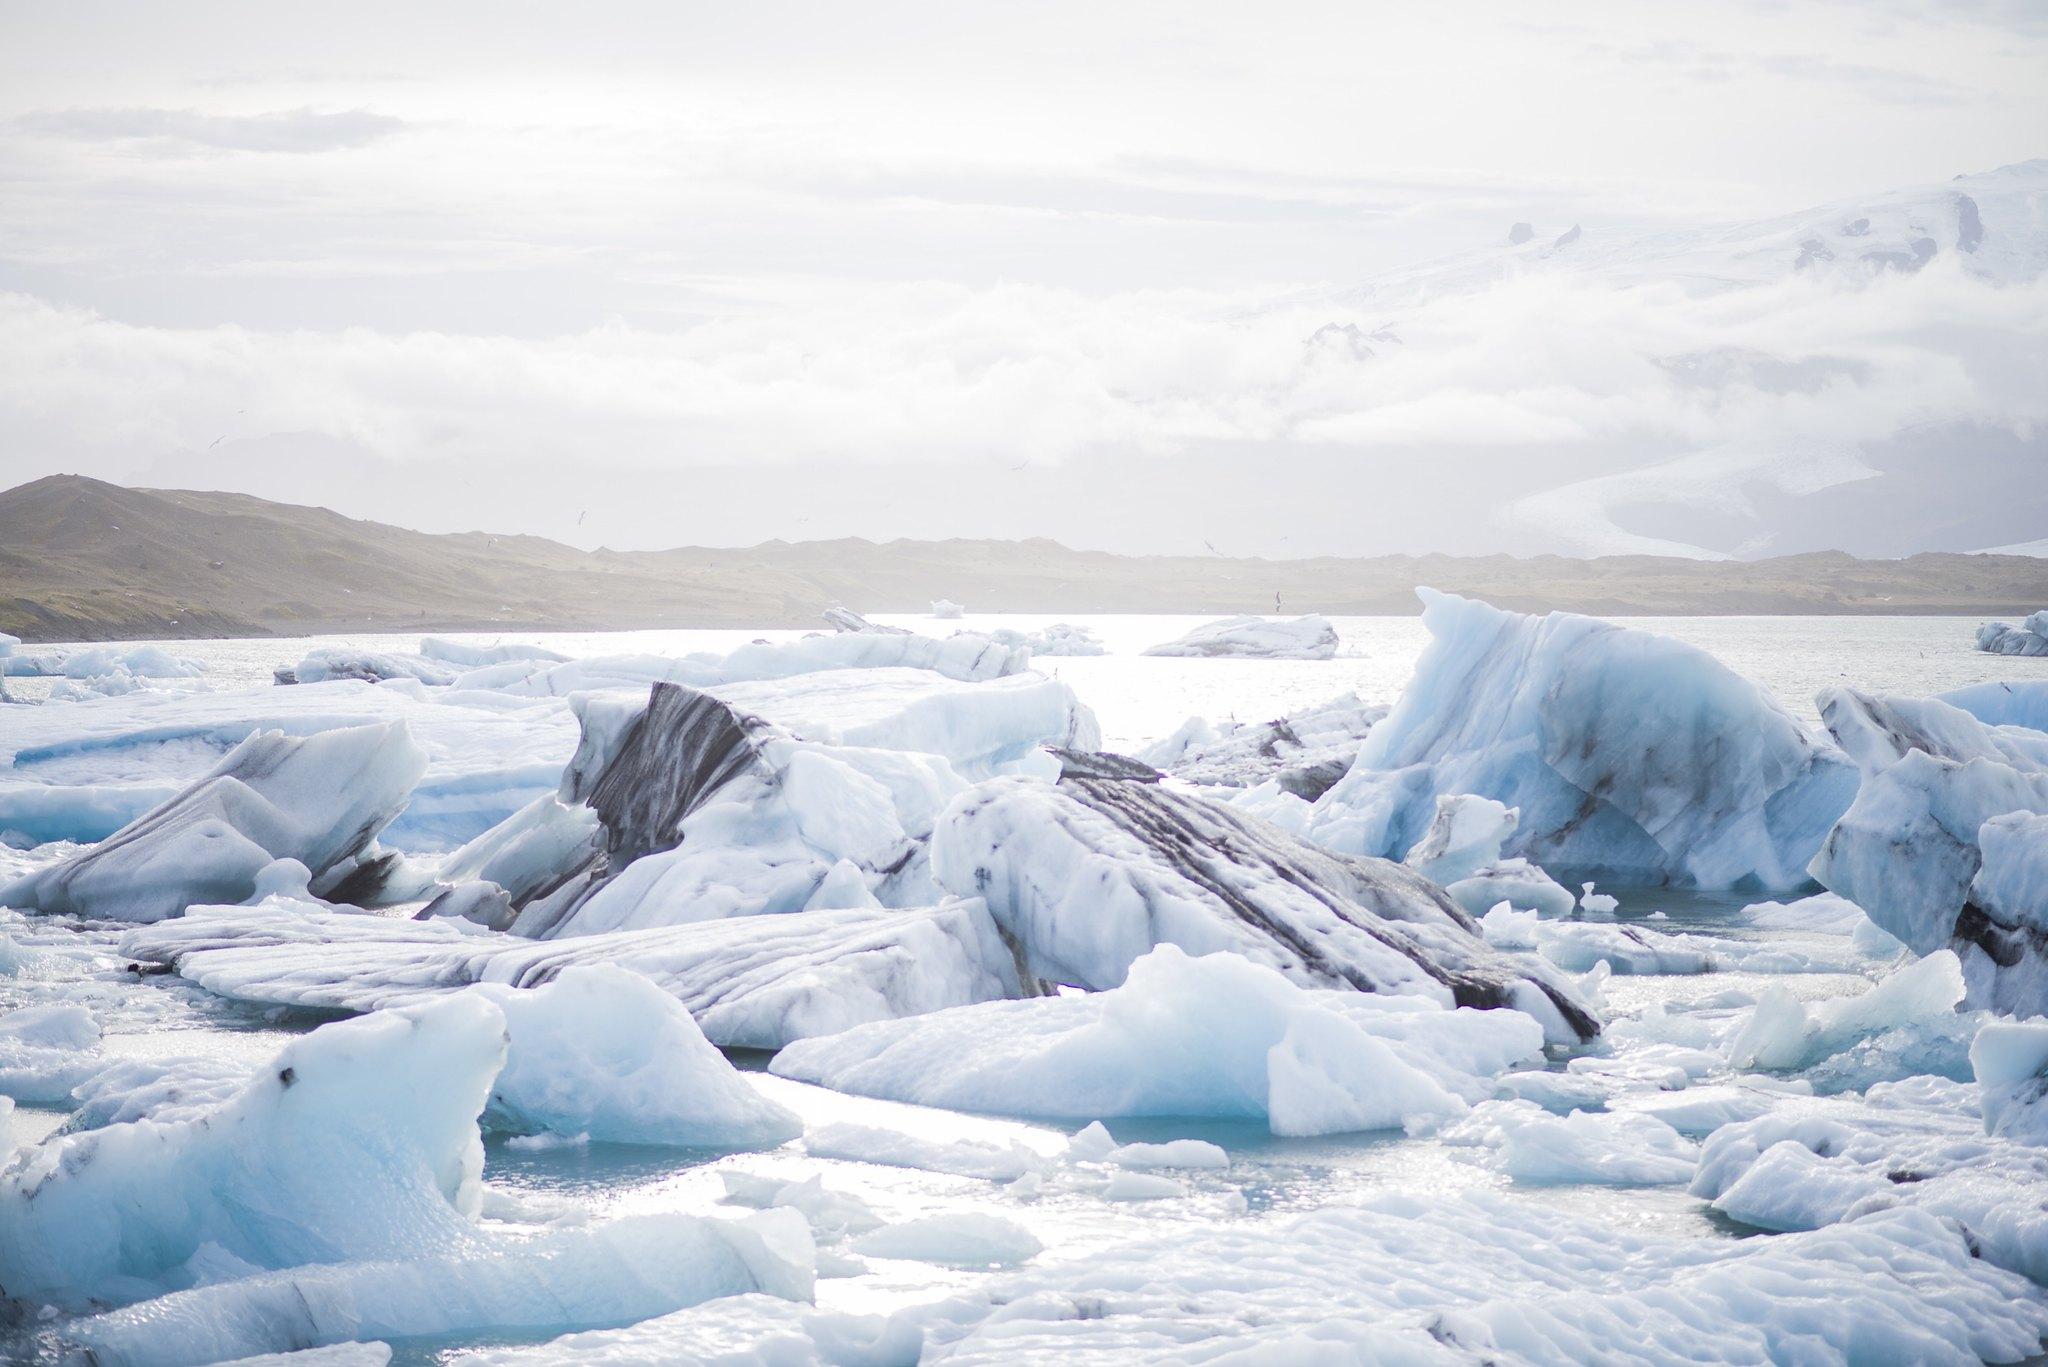 Thumbnail for 全球暖化與氣候變遷